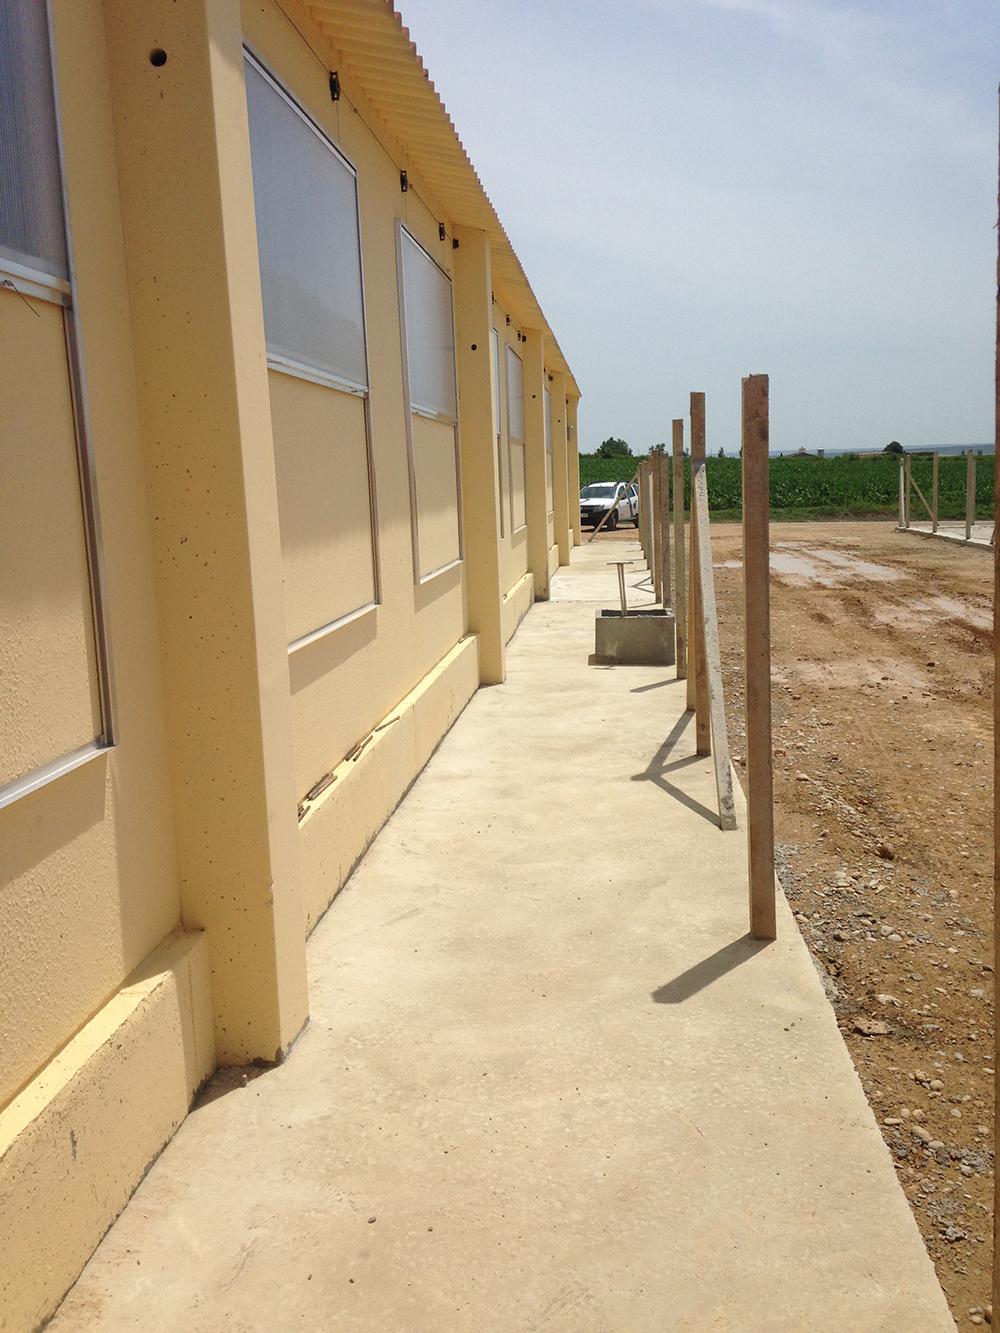 Paredes exteriores, ventanas policarbonato, acera perimetral i valla.